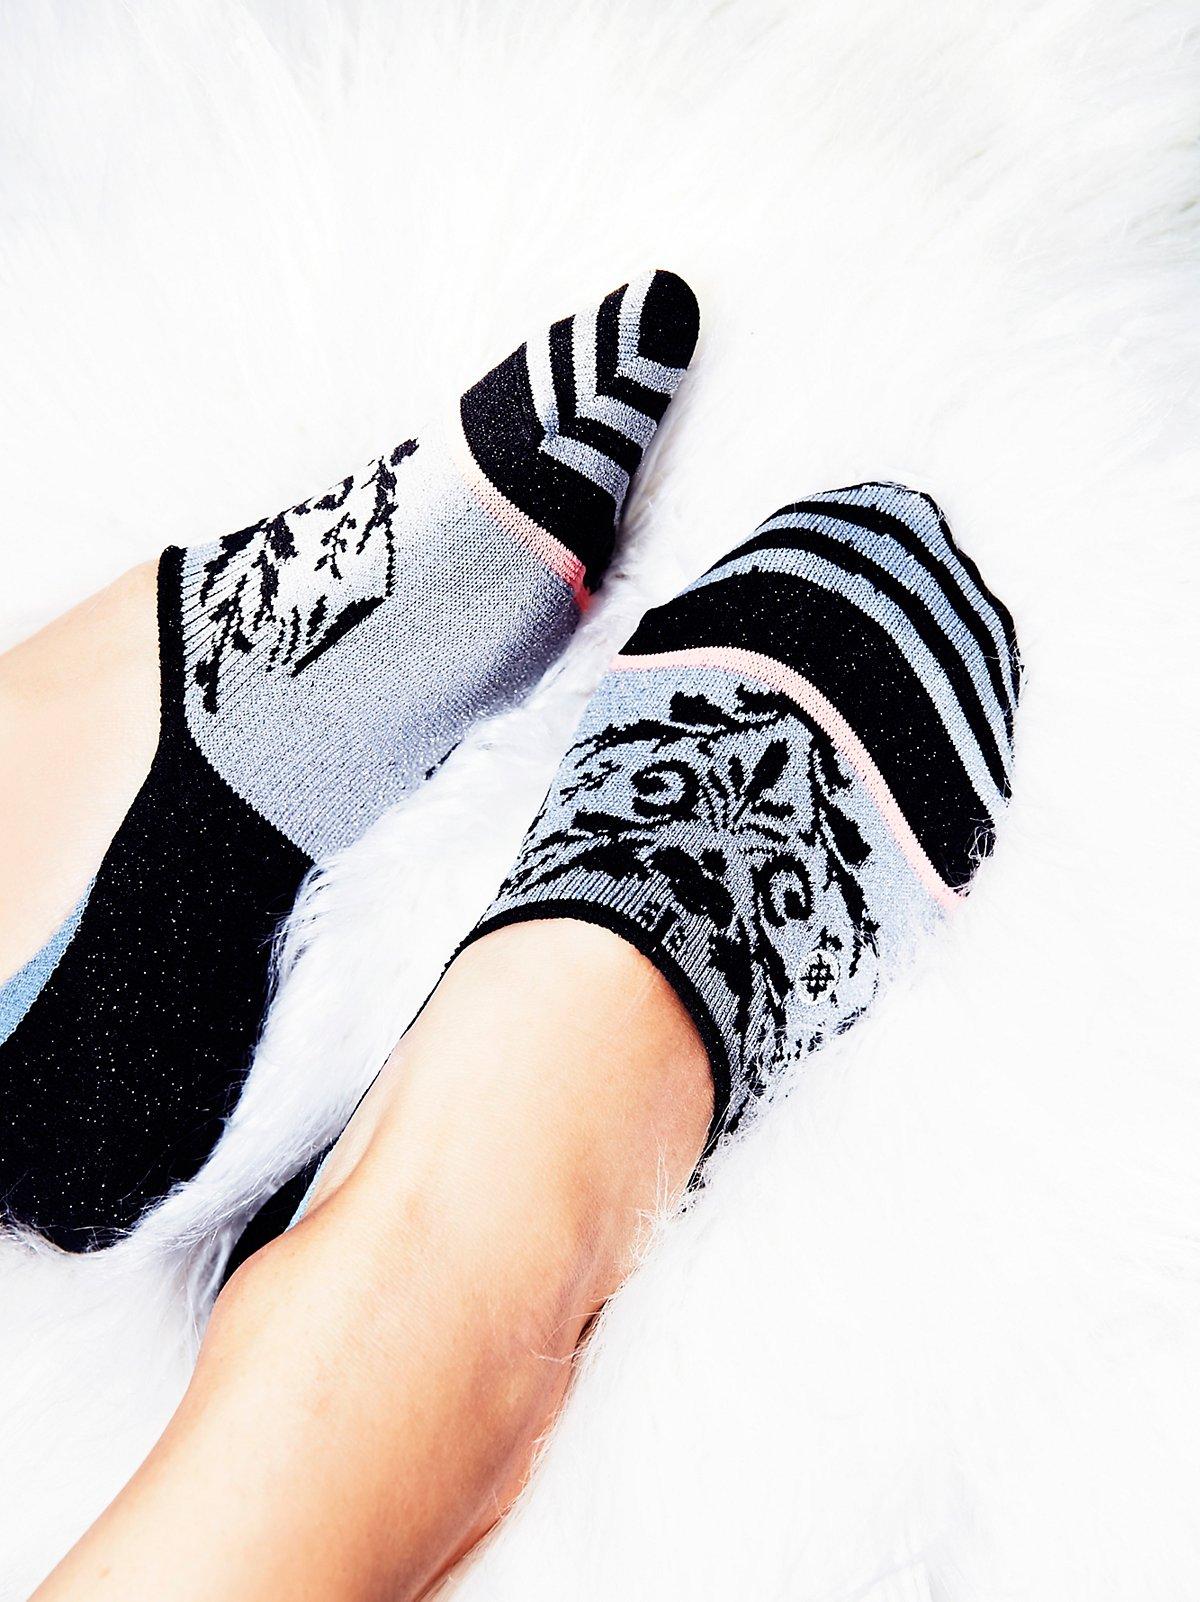 Sierra金银丝脚板袜